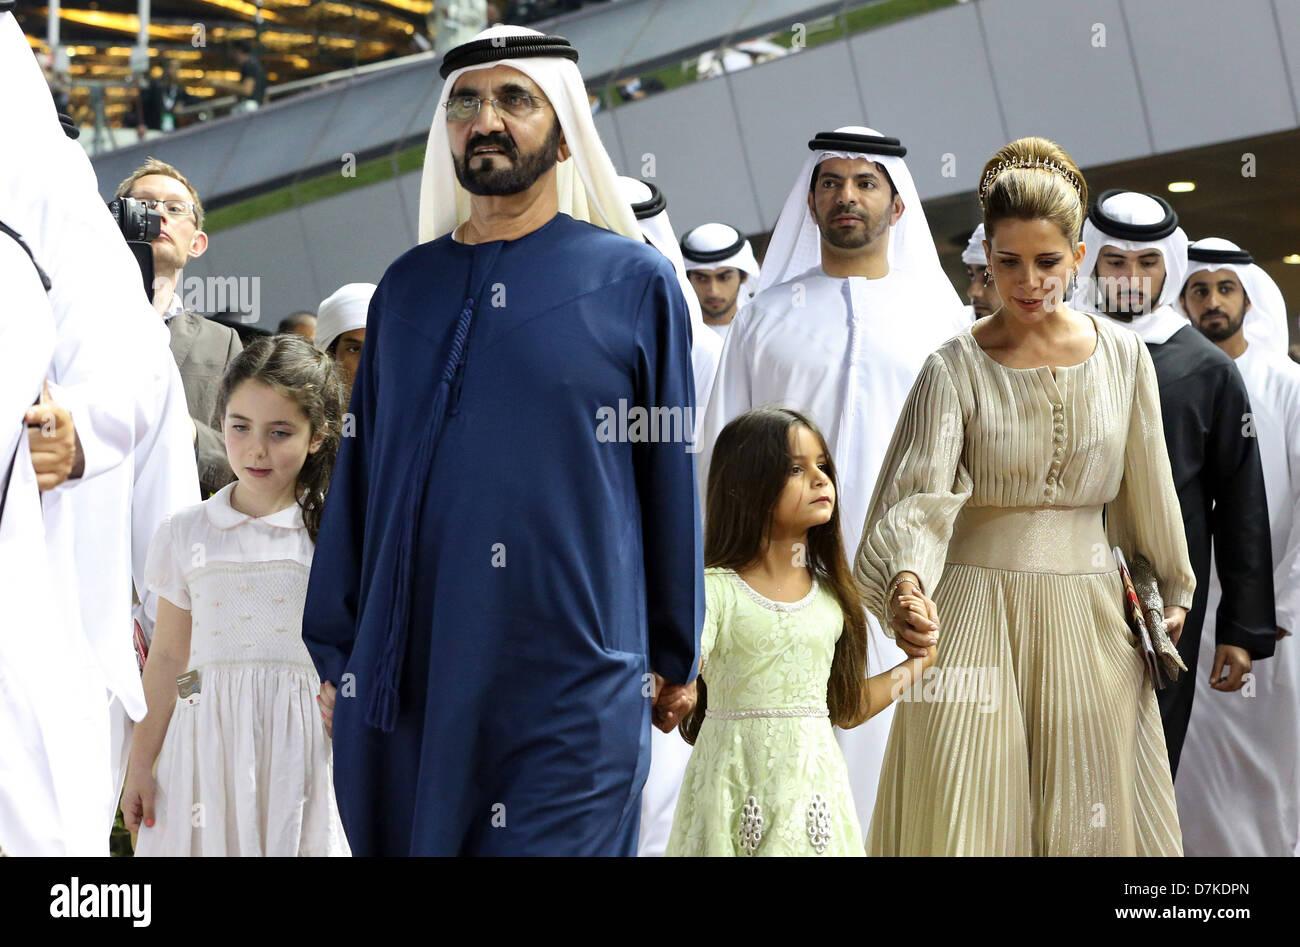 Sheikh Mohammed bin Rashid Al Maktoum (left) and his wife Princess